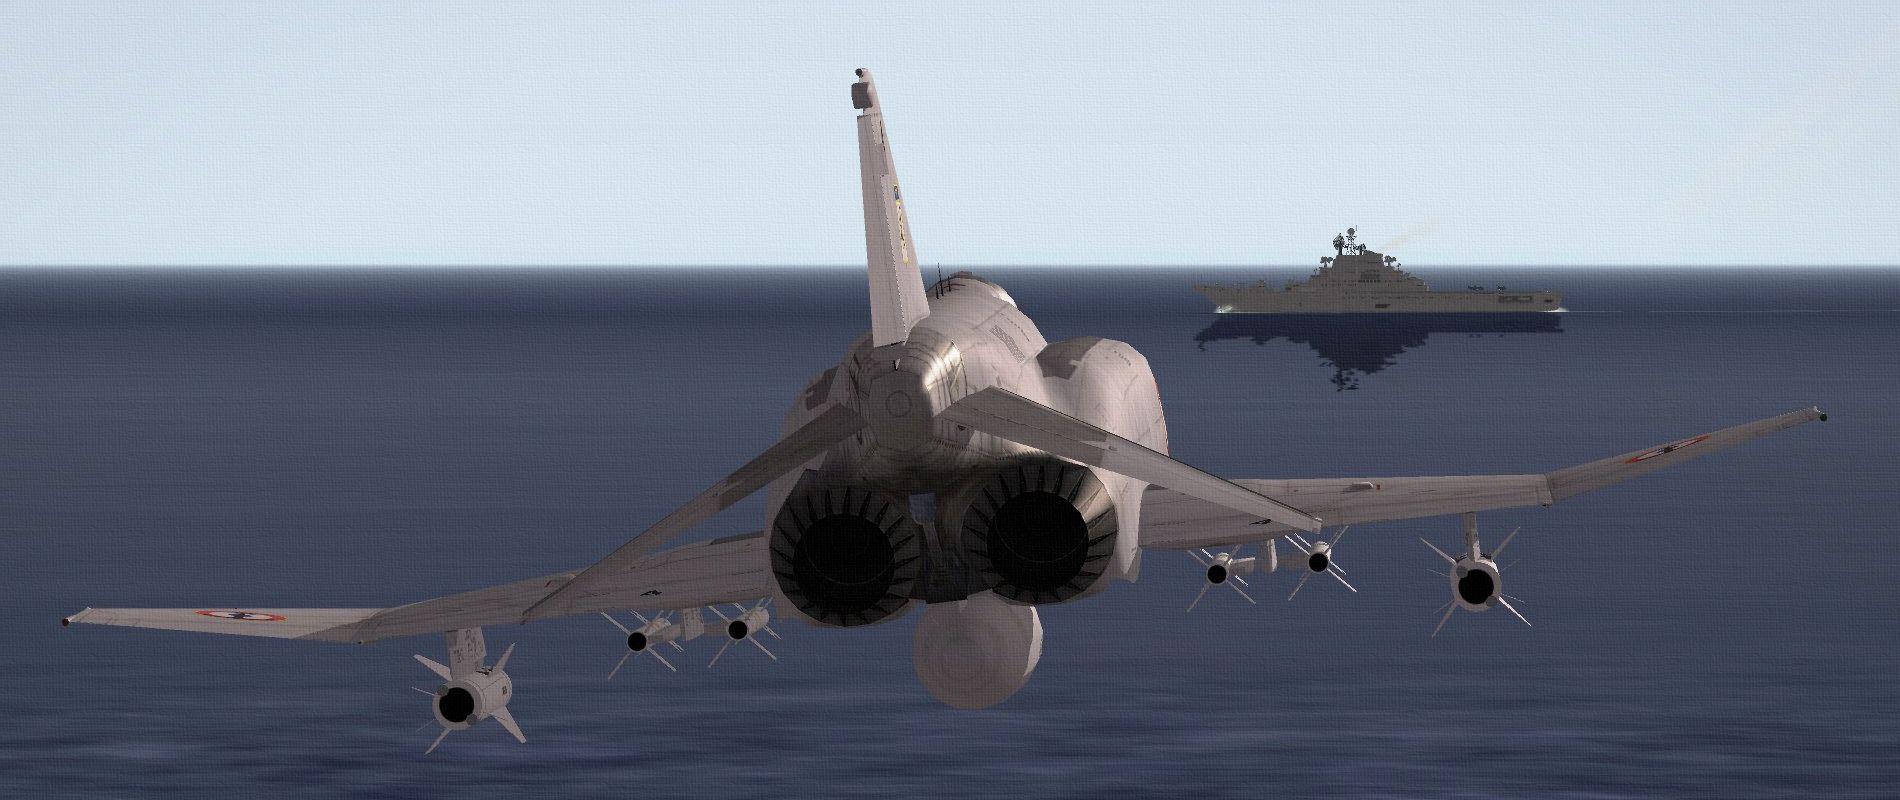 AERONAVALEF-4JPHANTOM11_zpsc031792a.jpg